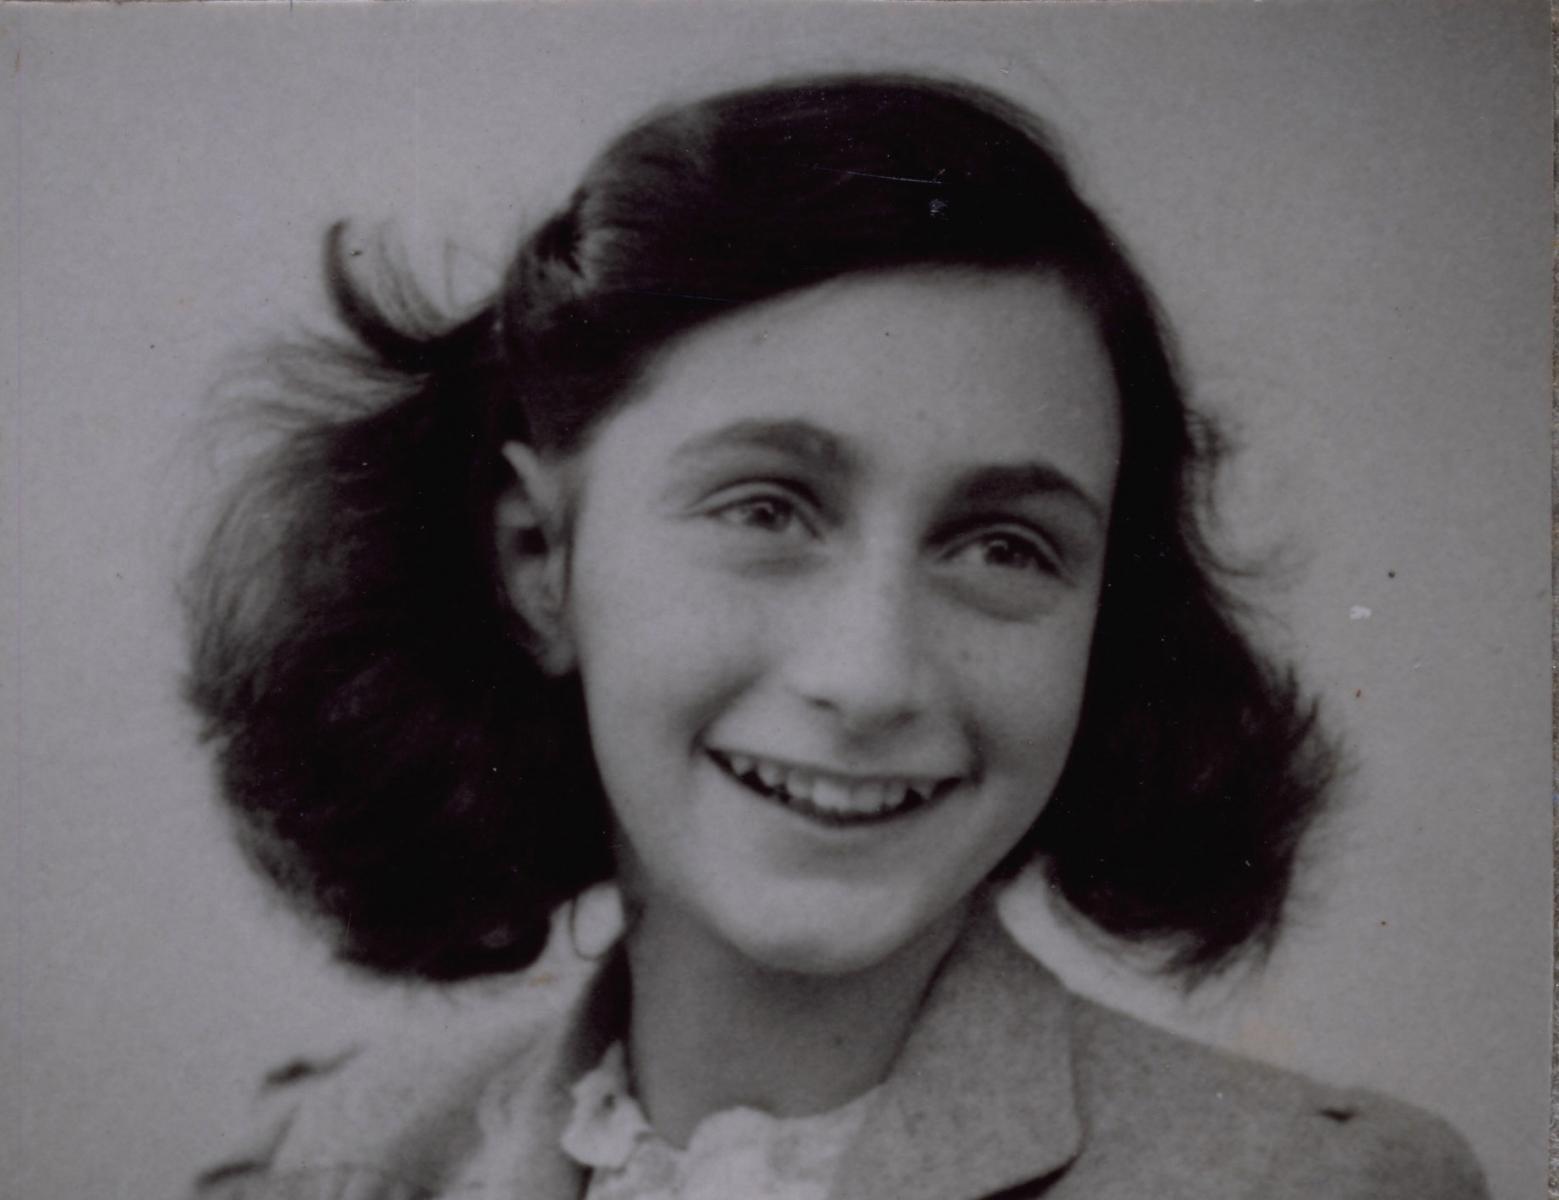 (c) Anne Frank Fond, Basel; Anne Frank Stichting, Amsterdam - anne_frank_crop